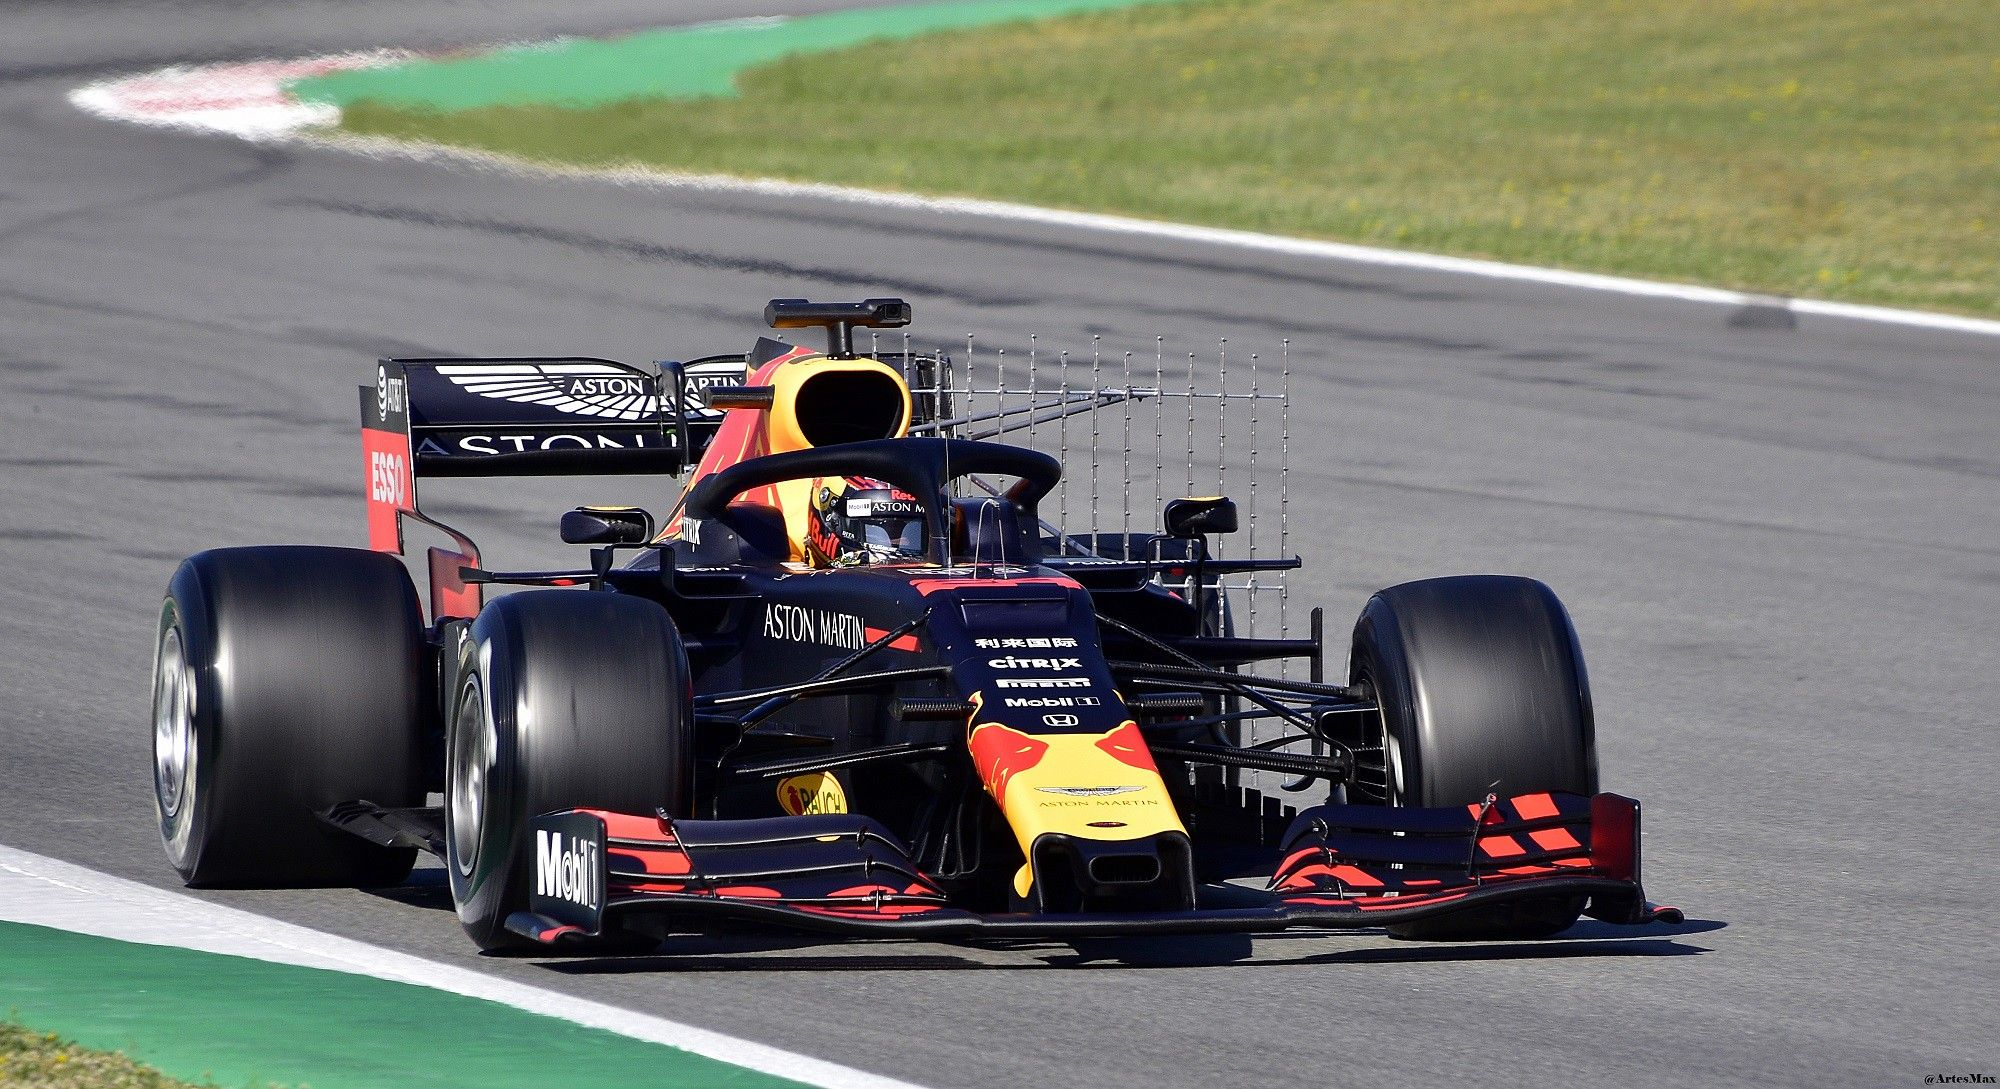 Pin On F1